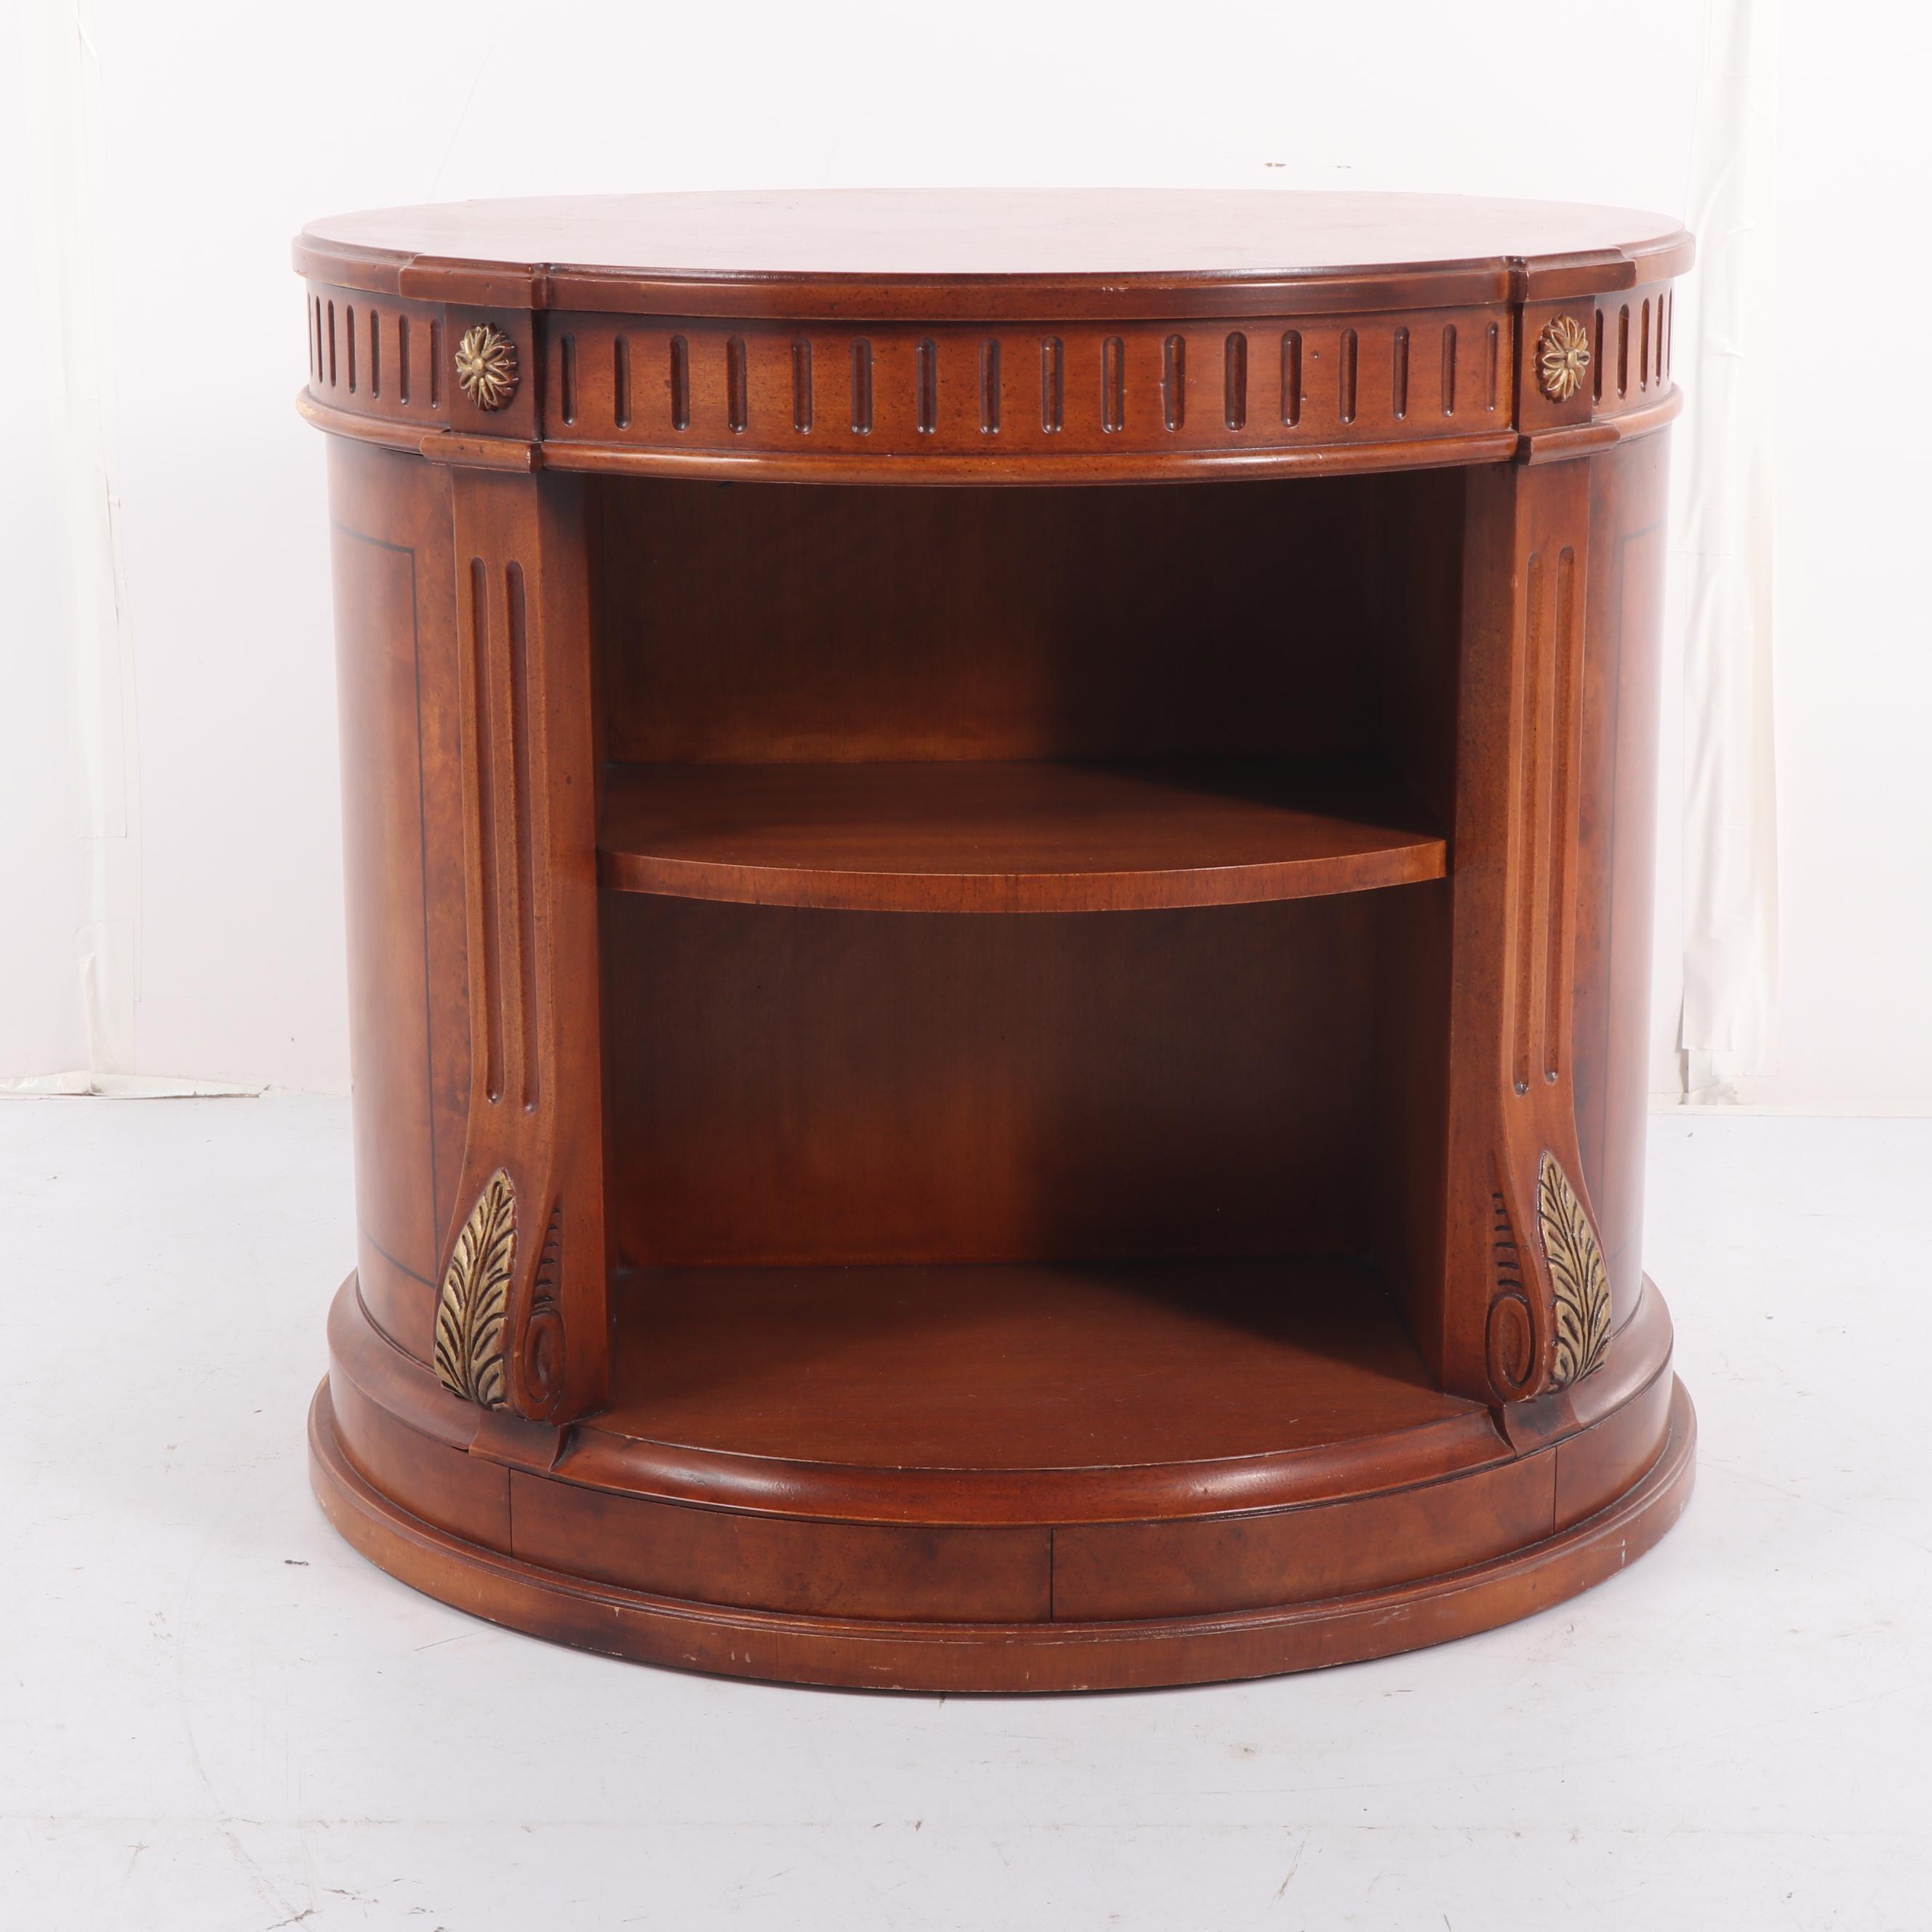 Federal Style Mahogany Finish Circular Side Table, 20th Century